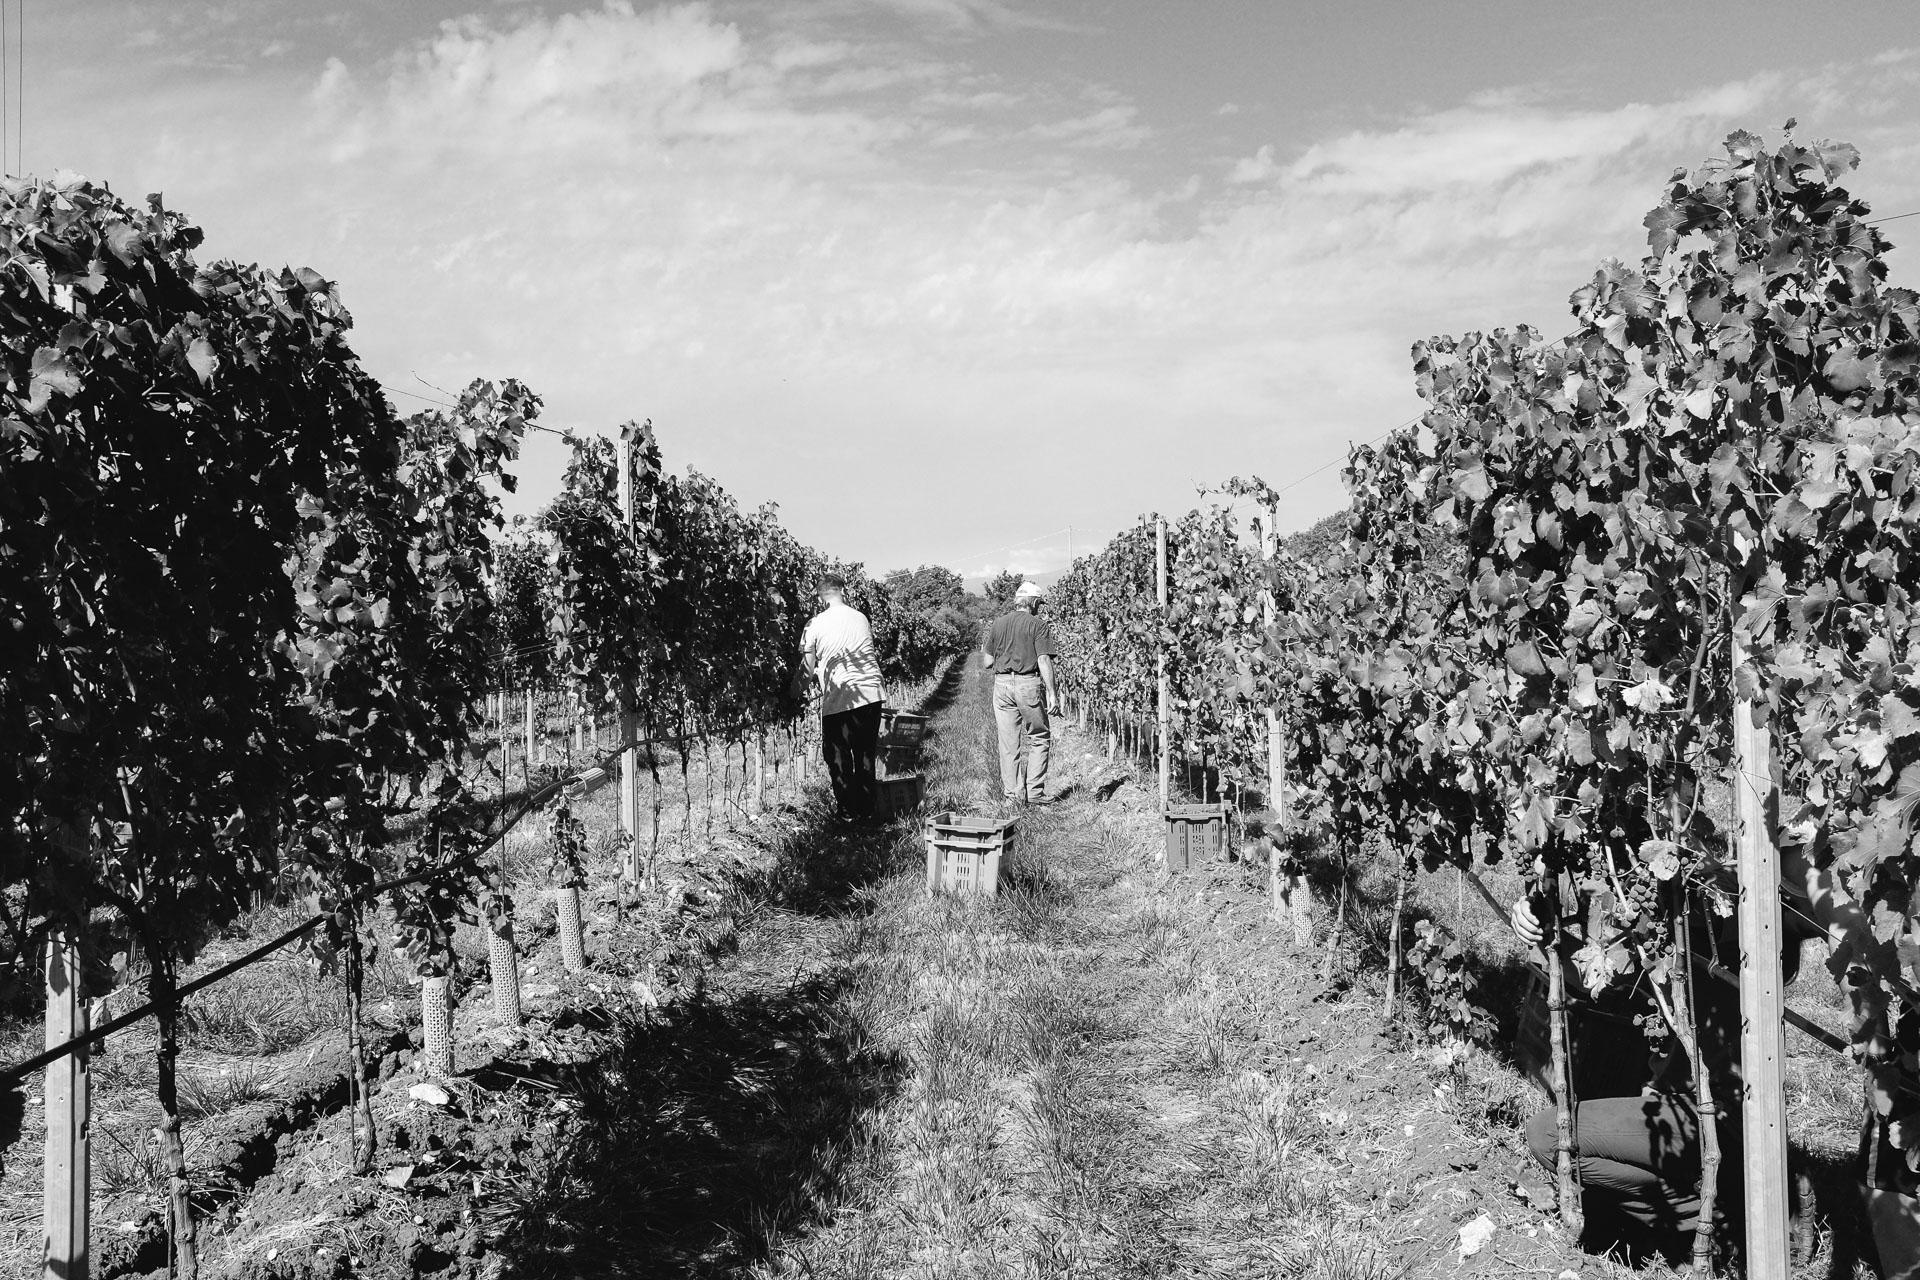 001-Sauro-maule-wineyards-organic-harvest-2016-_RUI2139_p_Lr_web_HD